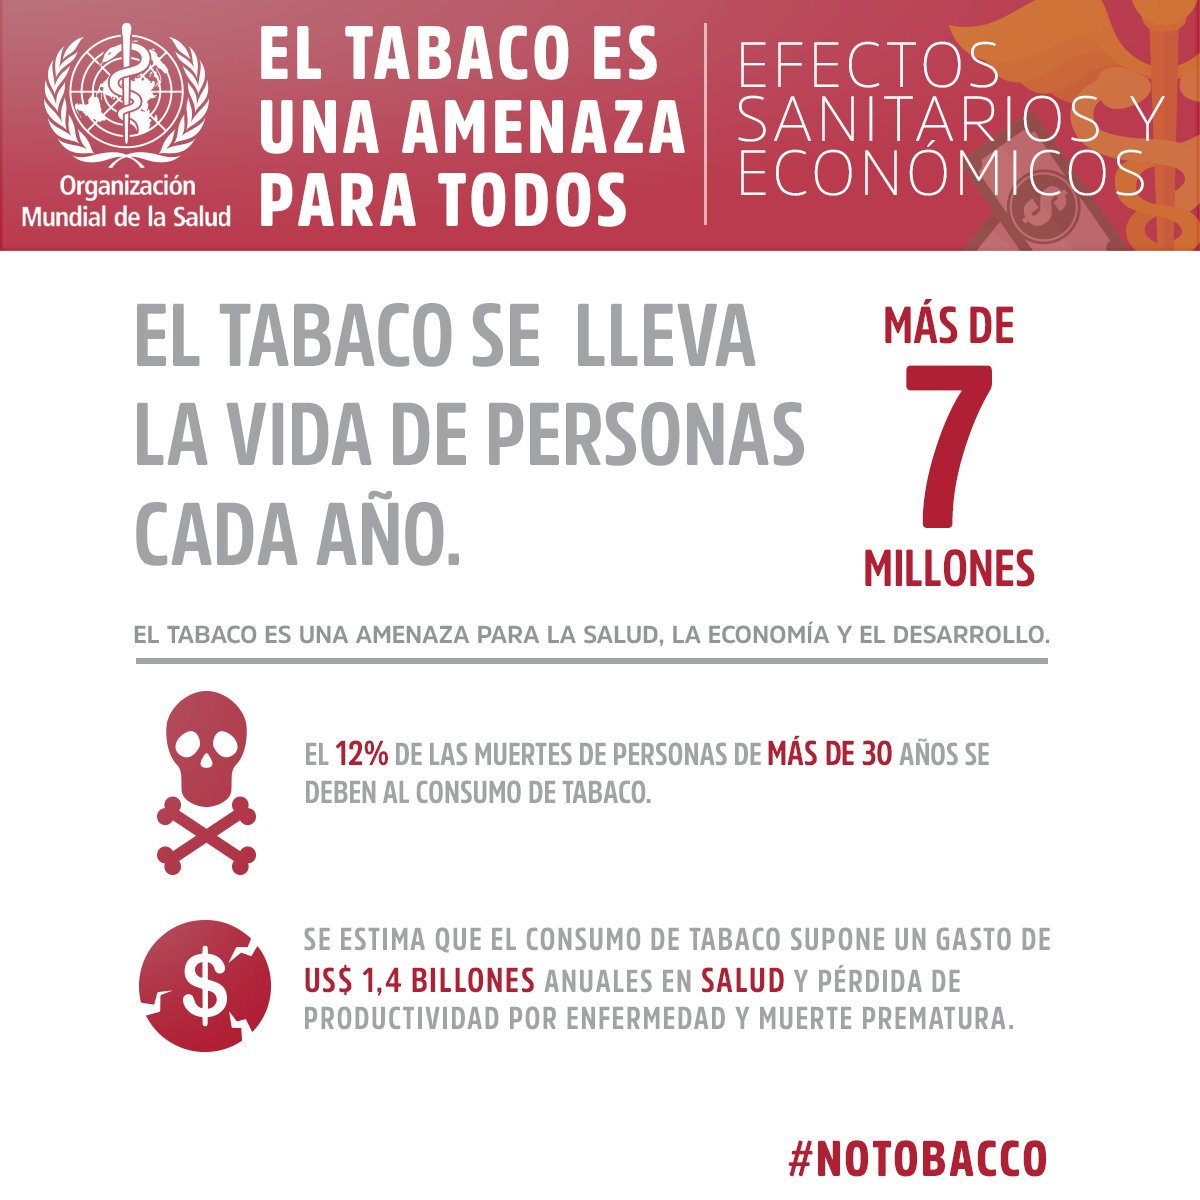 #NoTobacco https://t.co/RXQwKbMY1c